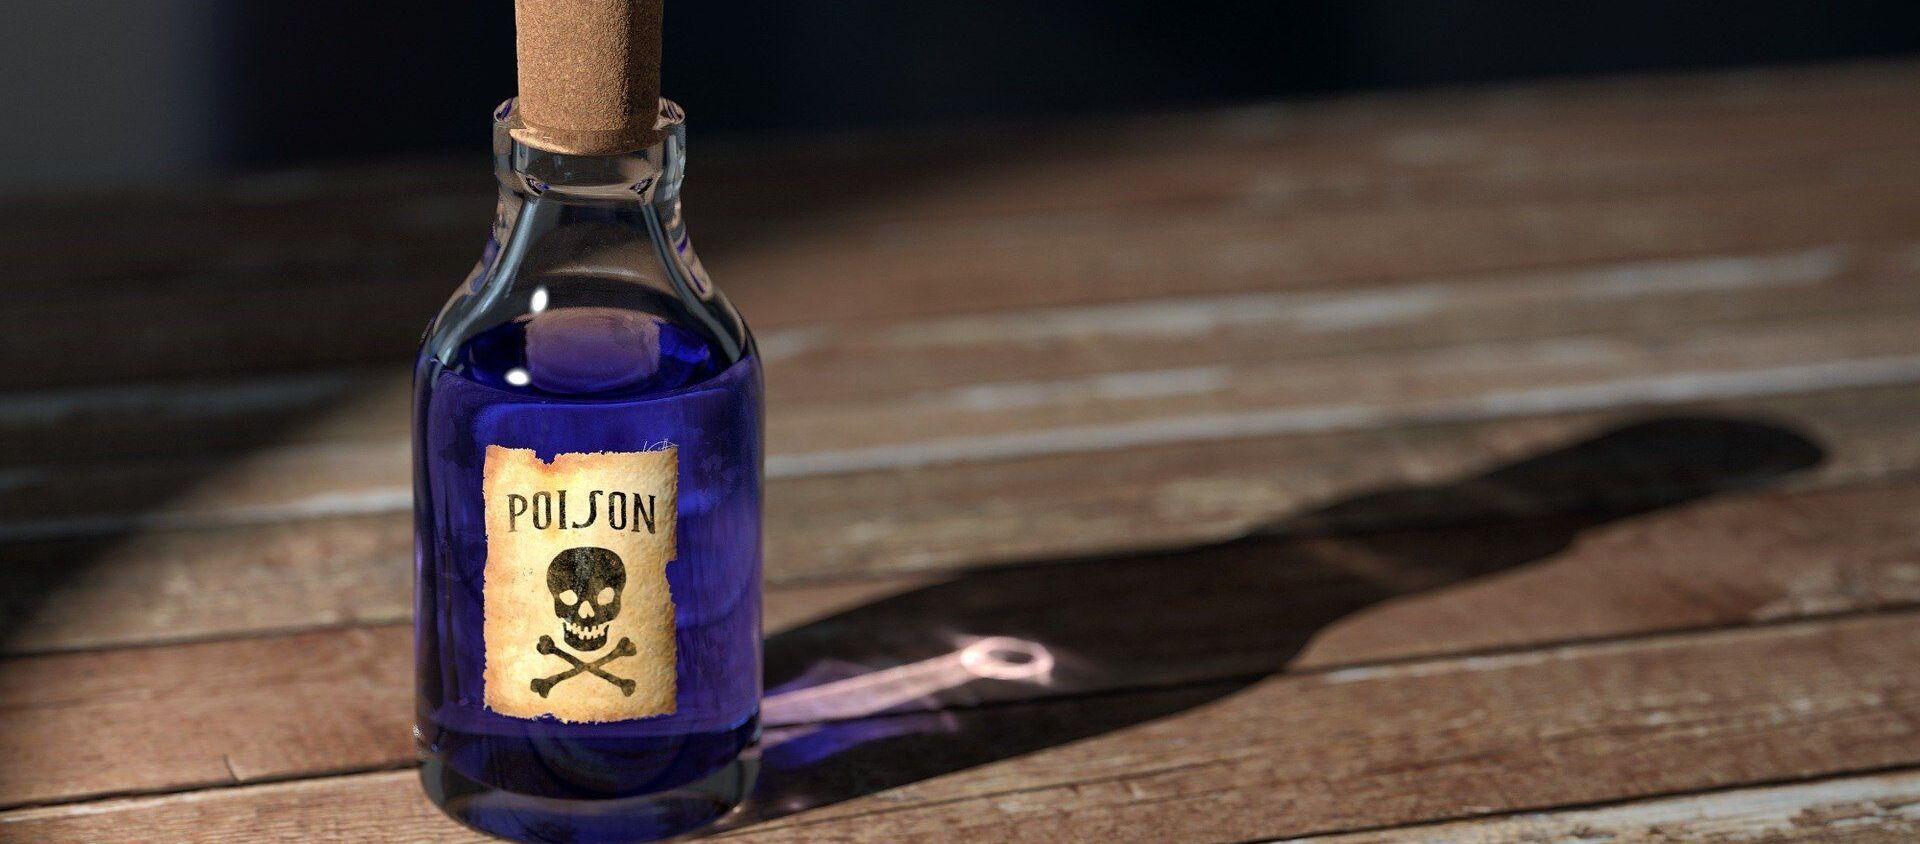 Small bottle of poison - Sputnik International, 1920, 16.06.2021